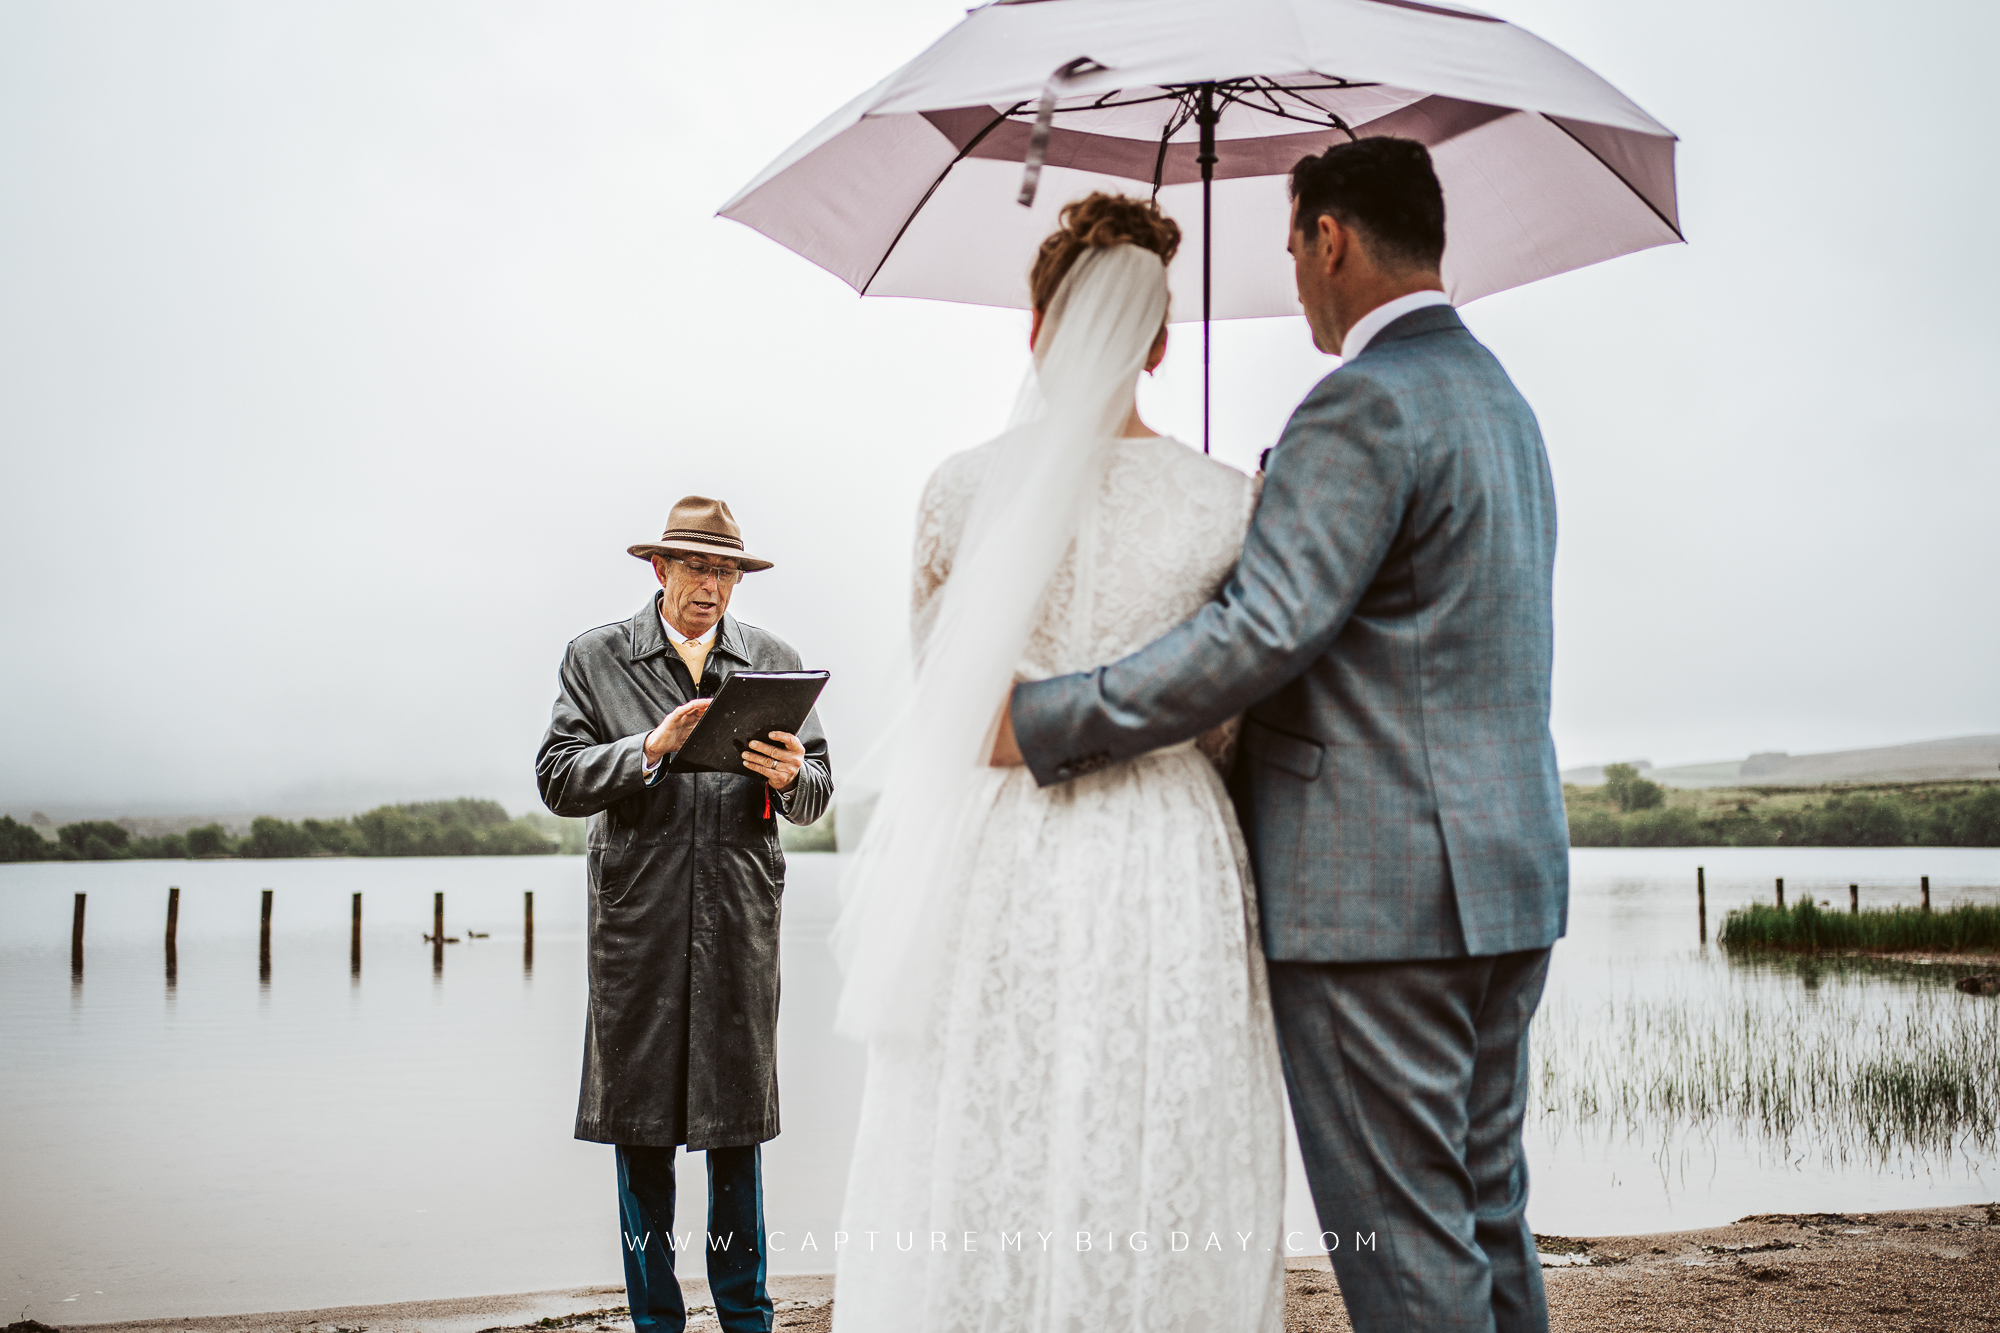 wedding ceremony in northern Ireland on beach